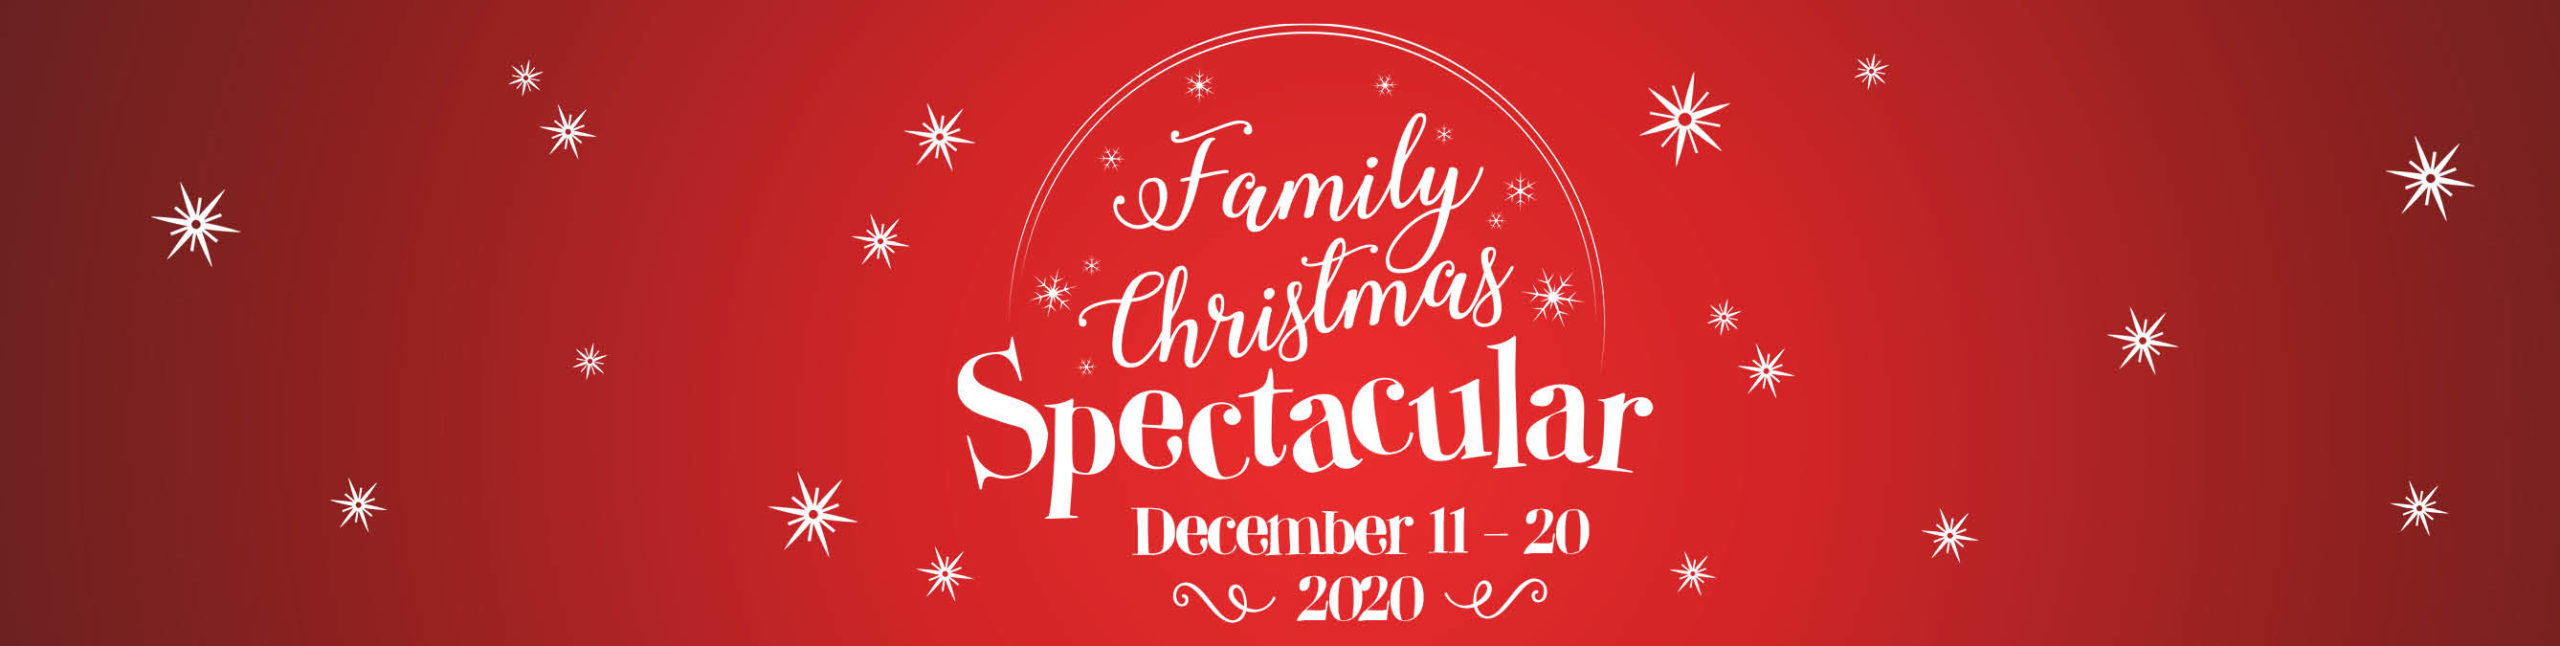 Family Christmas Spectacular